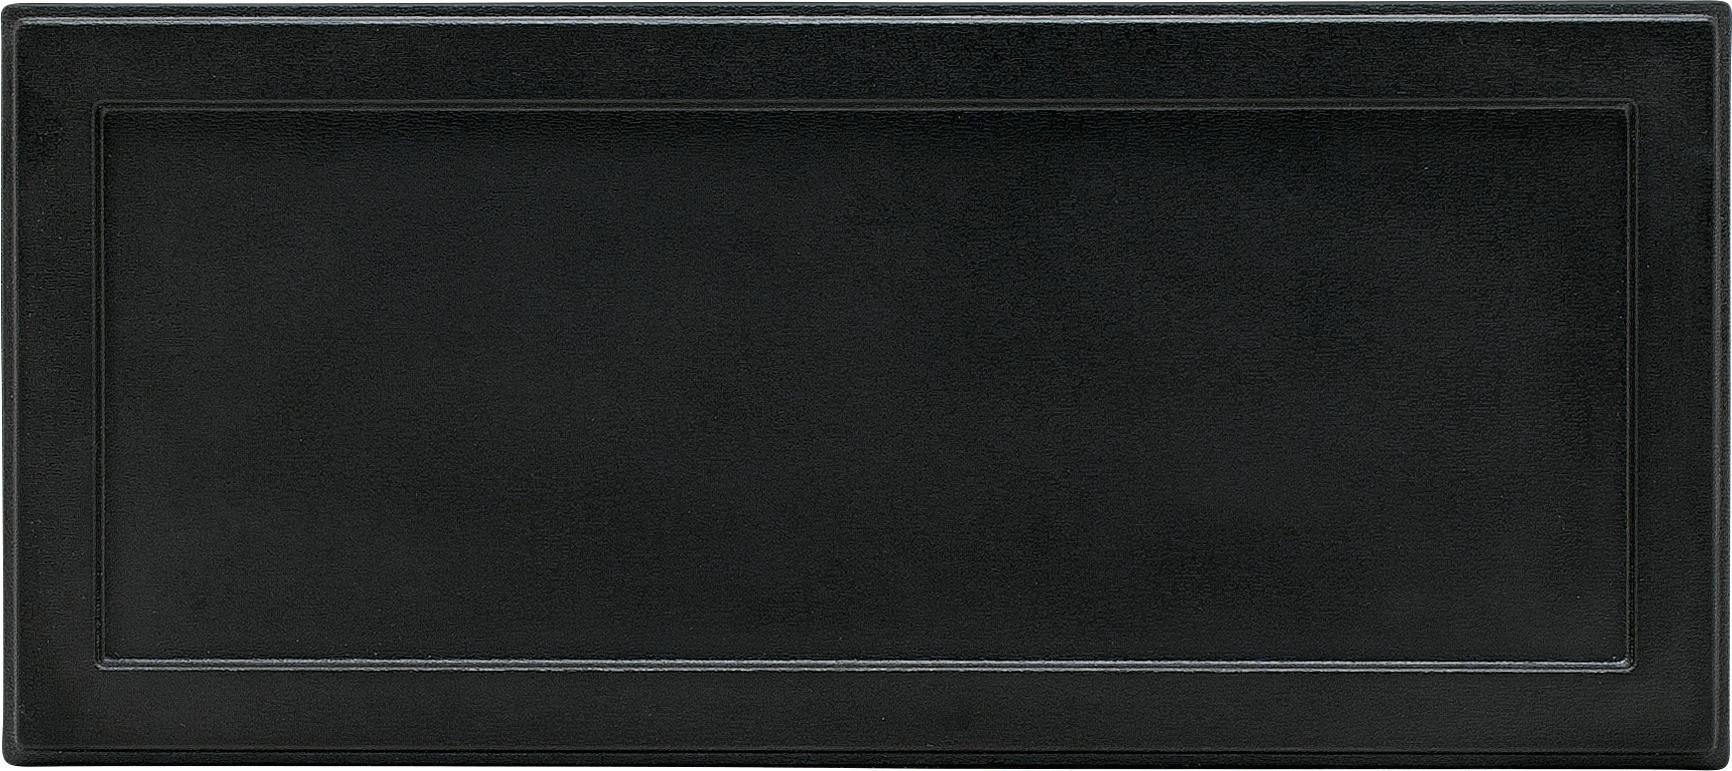 Emotion, Presenter (Kunststoff) stapelbar 408 x 178 x 42 mm schwarz